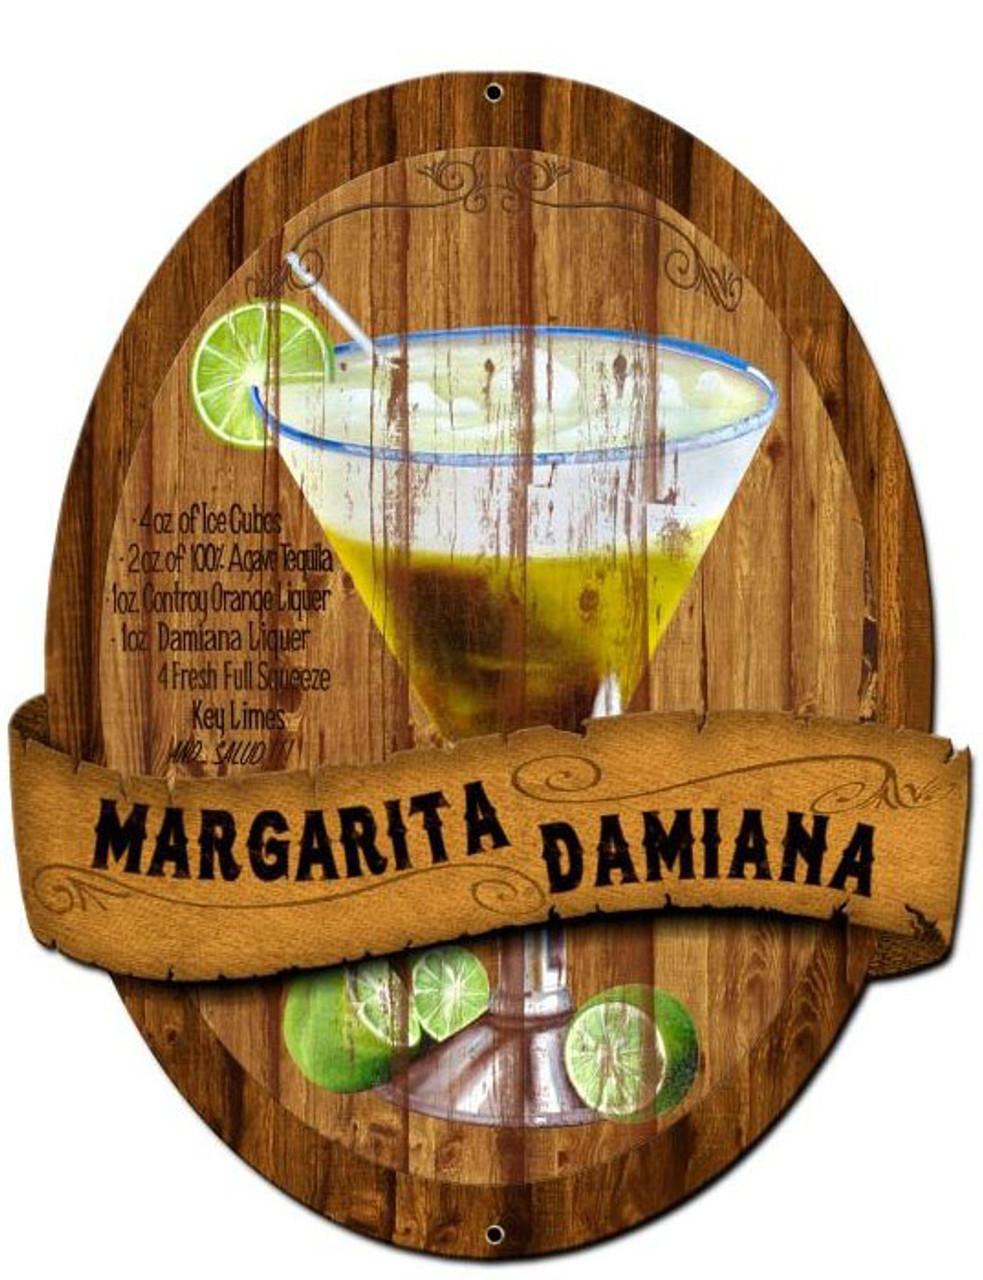 Margarita Damiana Recipe Custom Shape Metal Sign 20 x 24 Inches